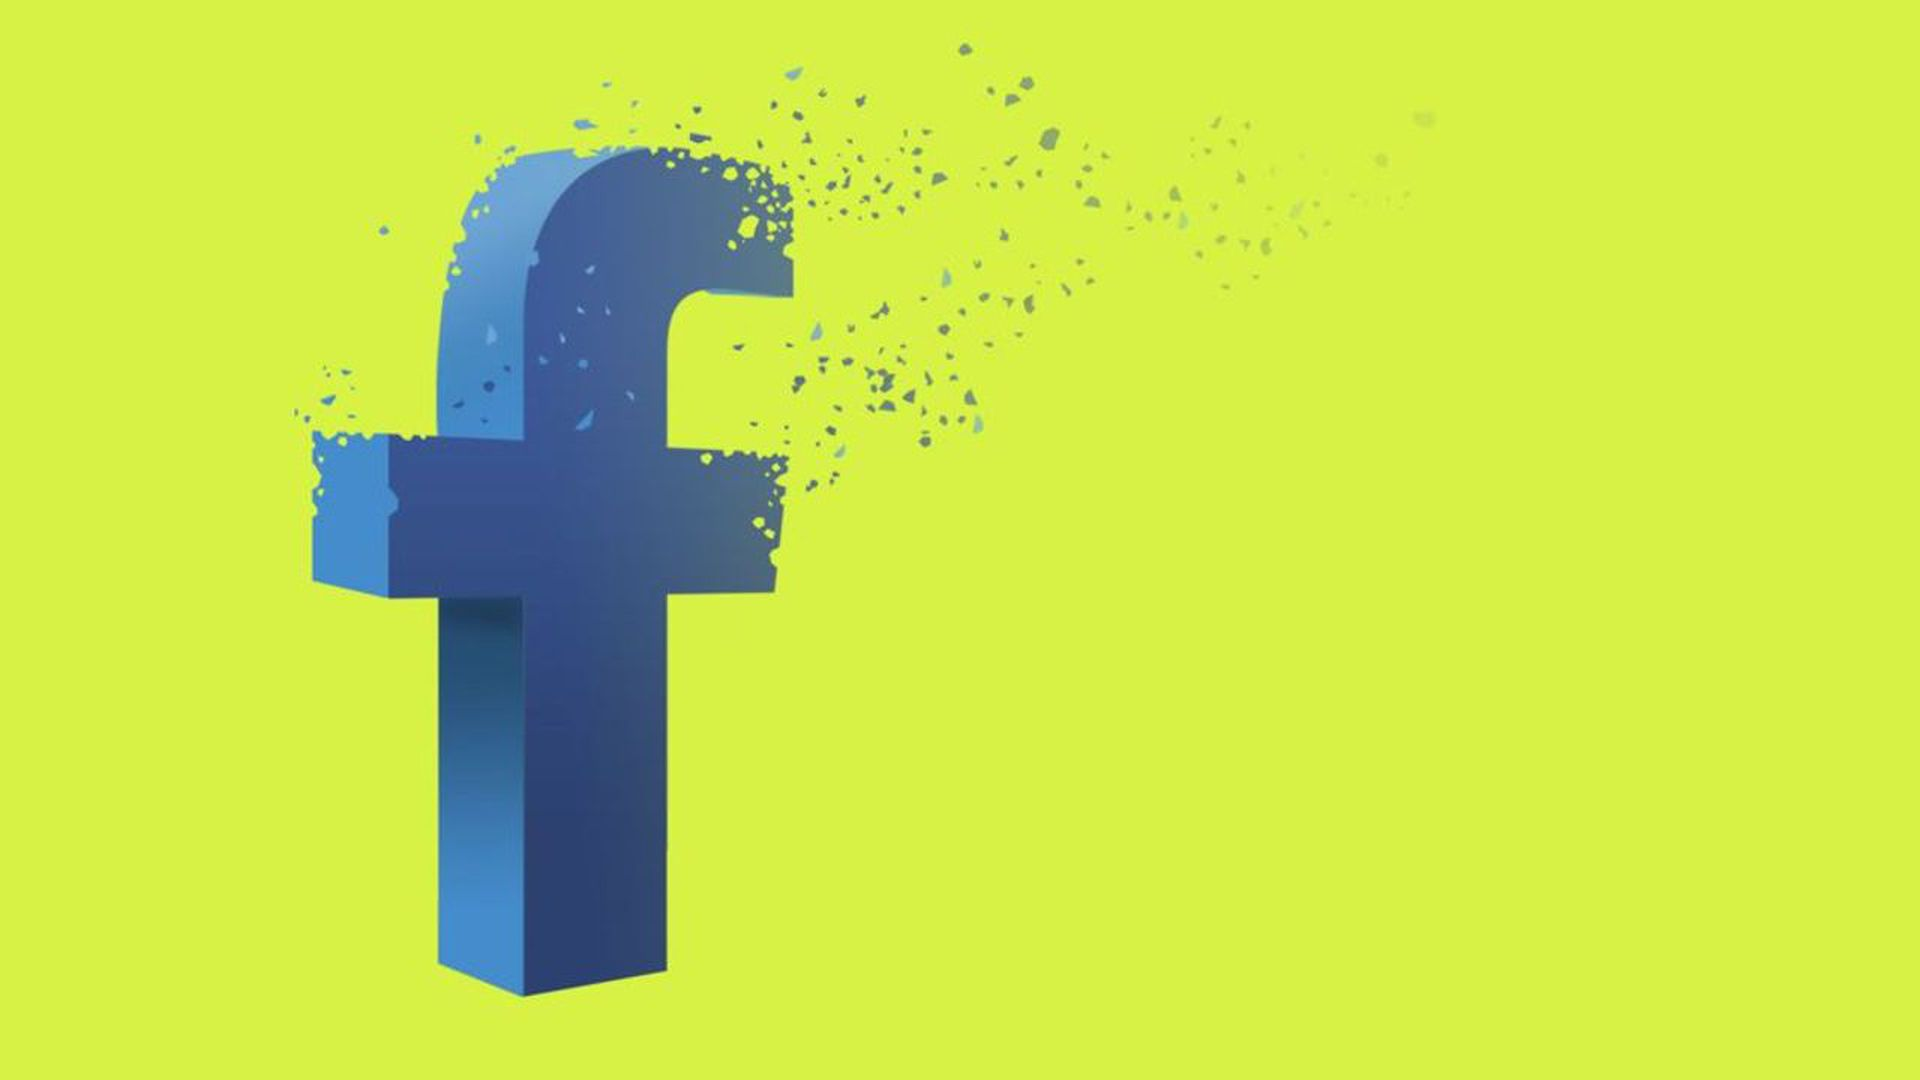 Illustration of the Facebook F logo deteriorating